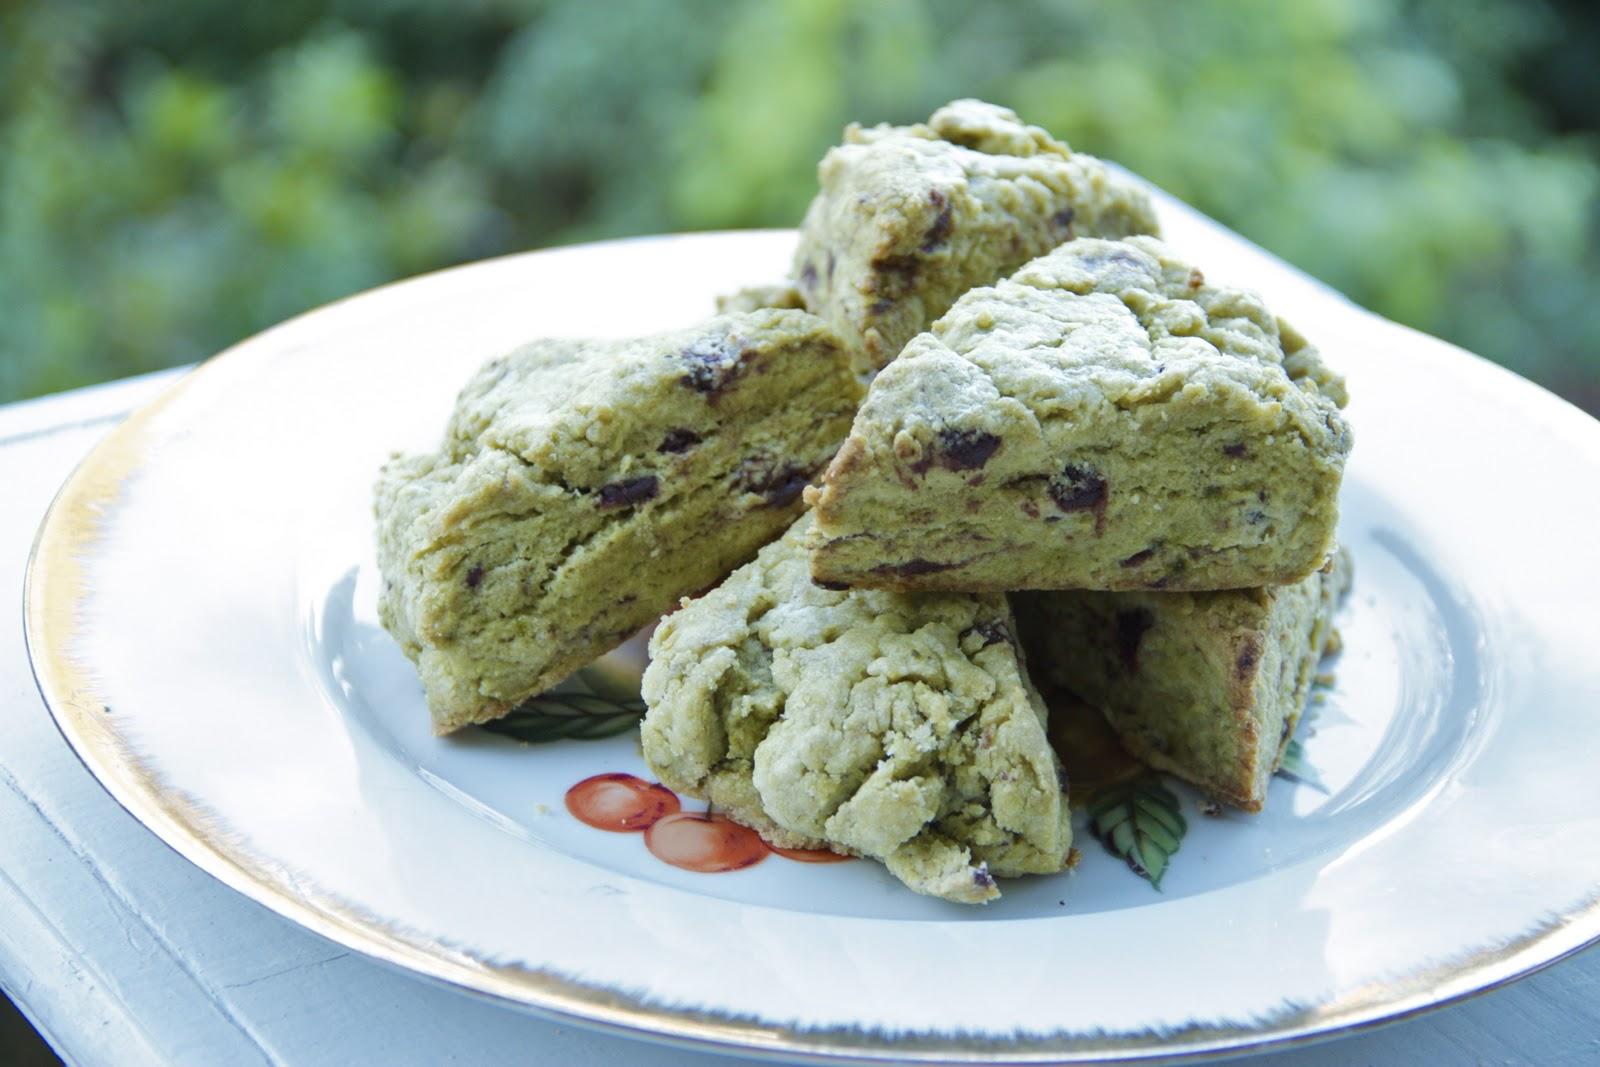 Green Tea And Dark Chocolate Scones